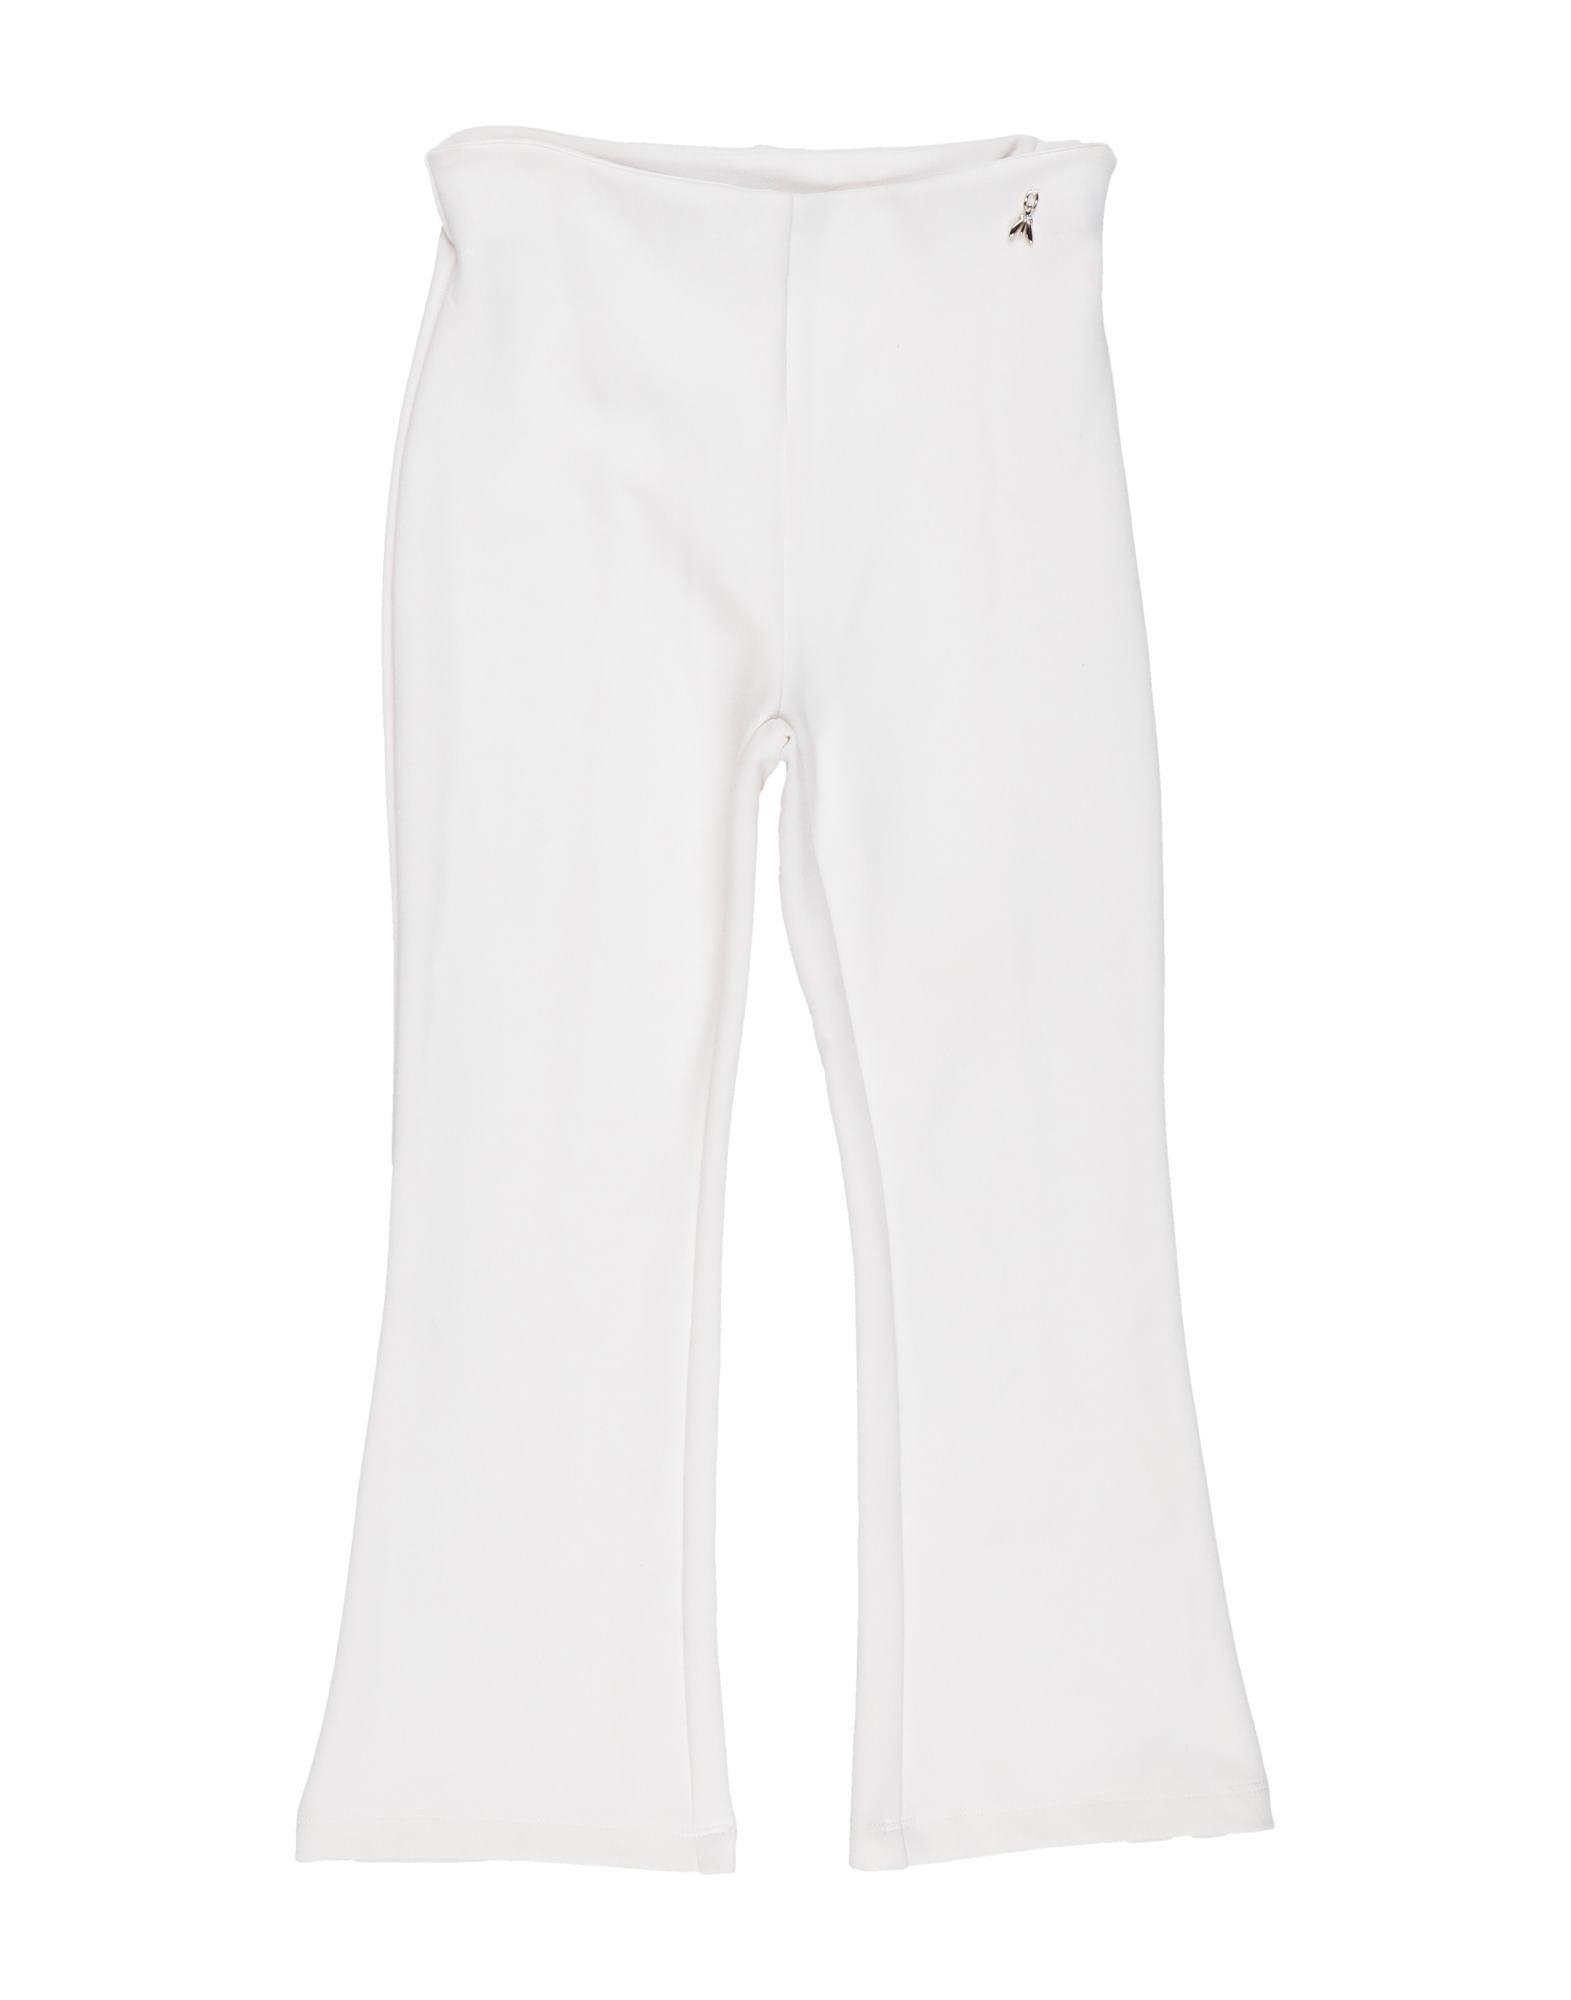 Patrizia Pepe Kids' Casual Pants In White